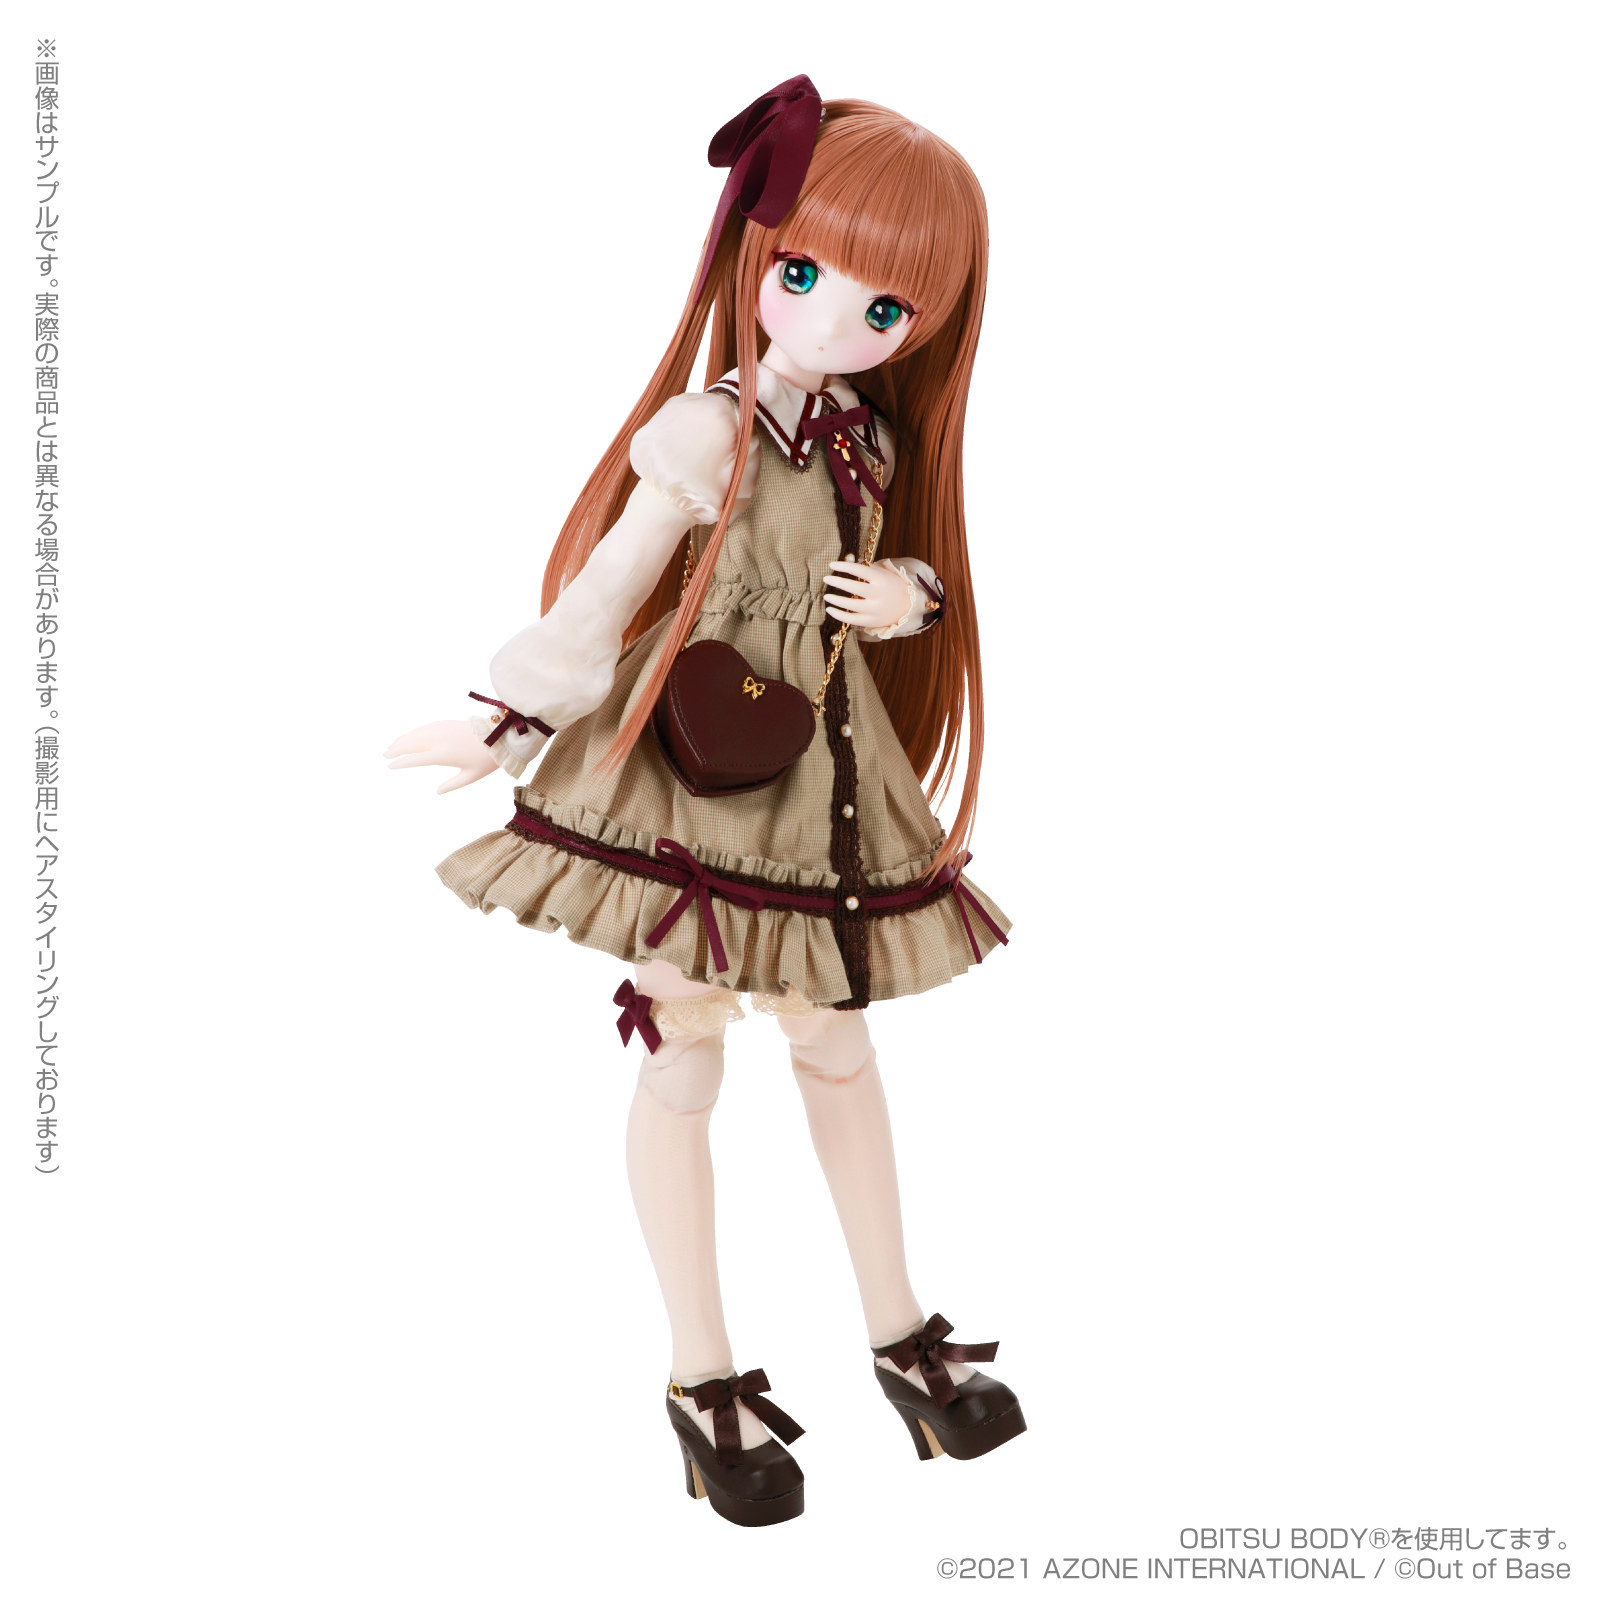 Iris Collect petit『あんな/~Wonder fraulein~Eternal Princess(通常販売ver.)』1/3 完成品ドール-022